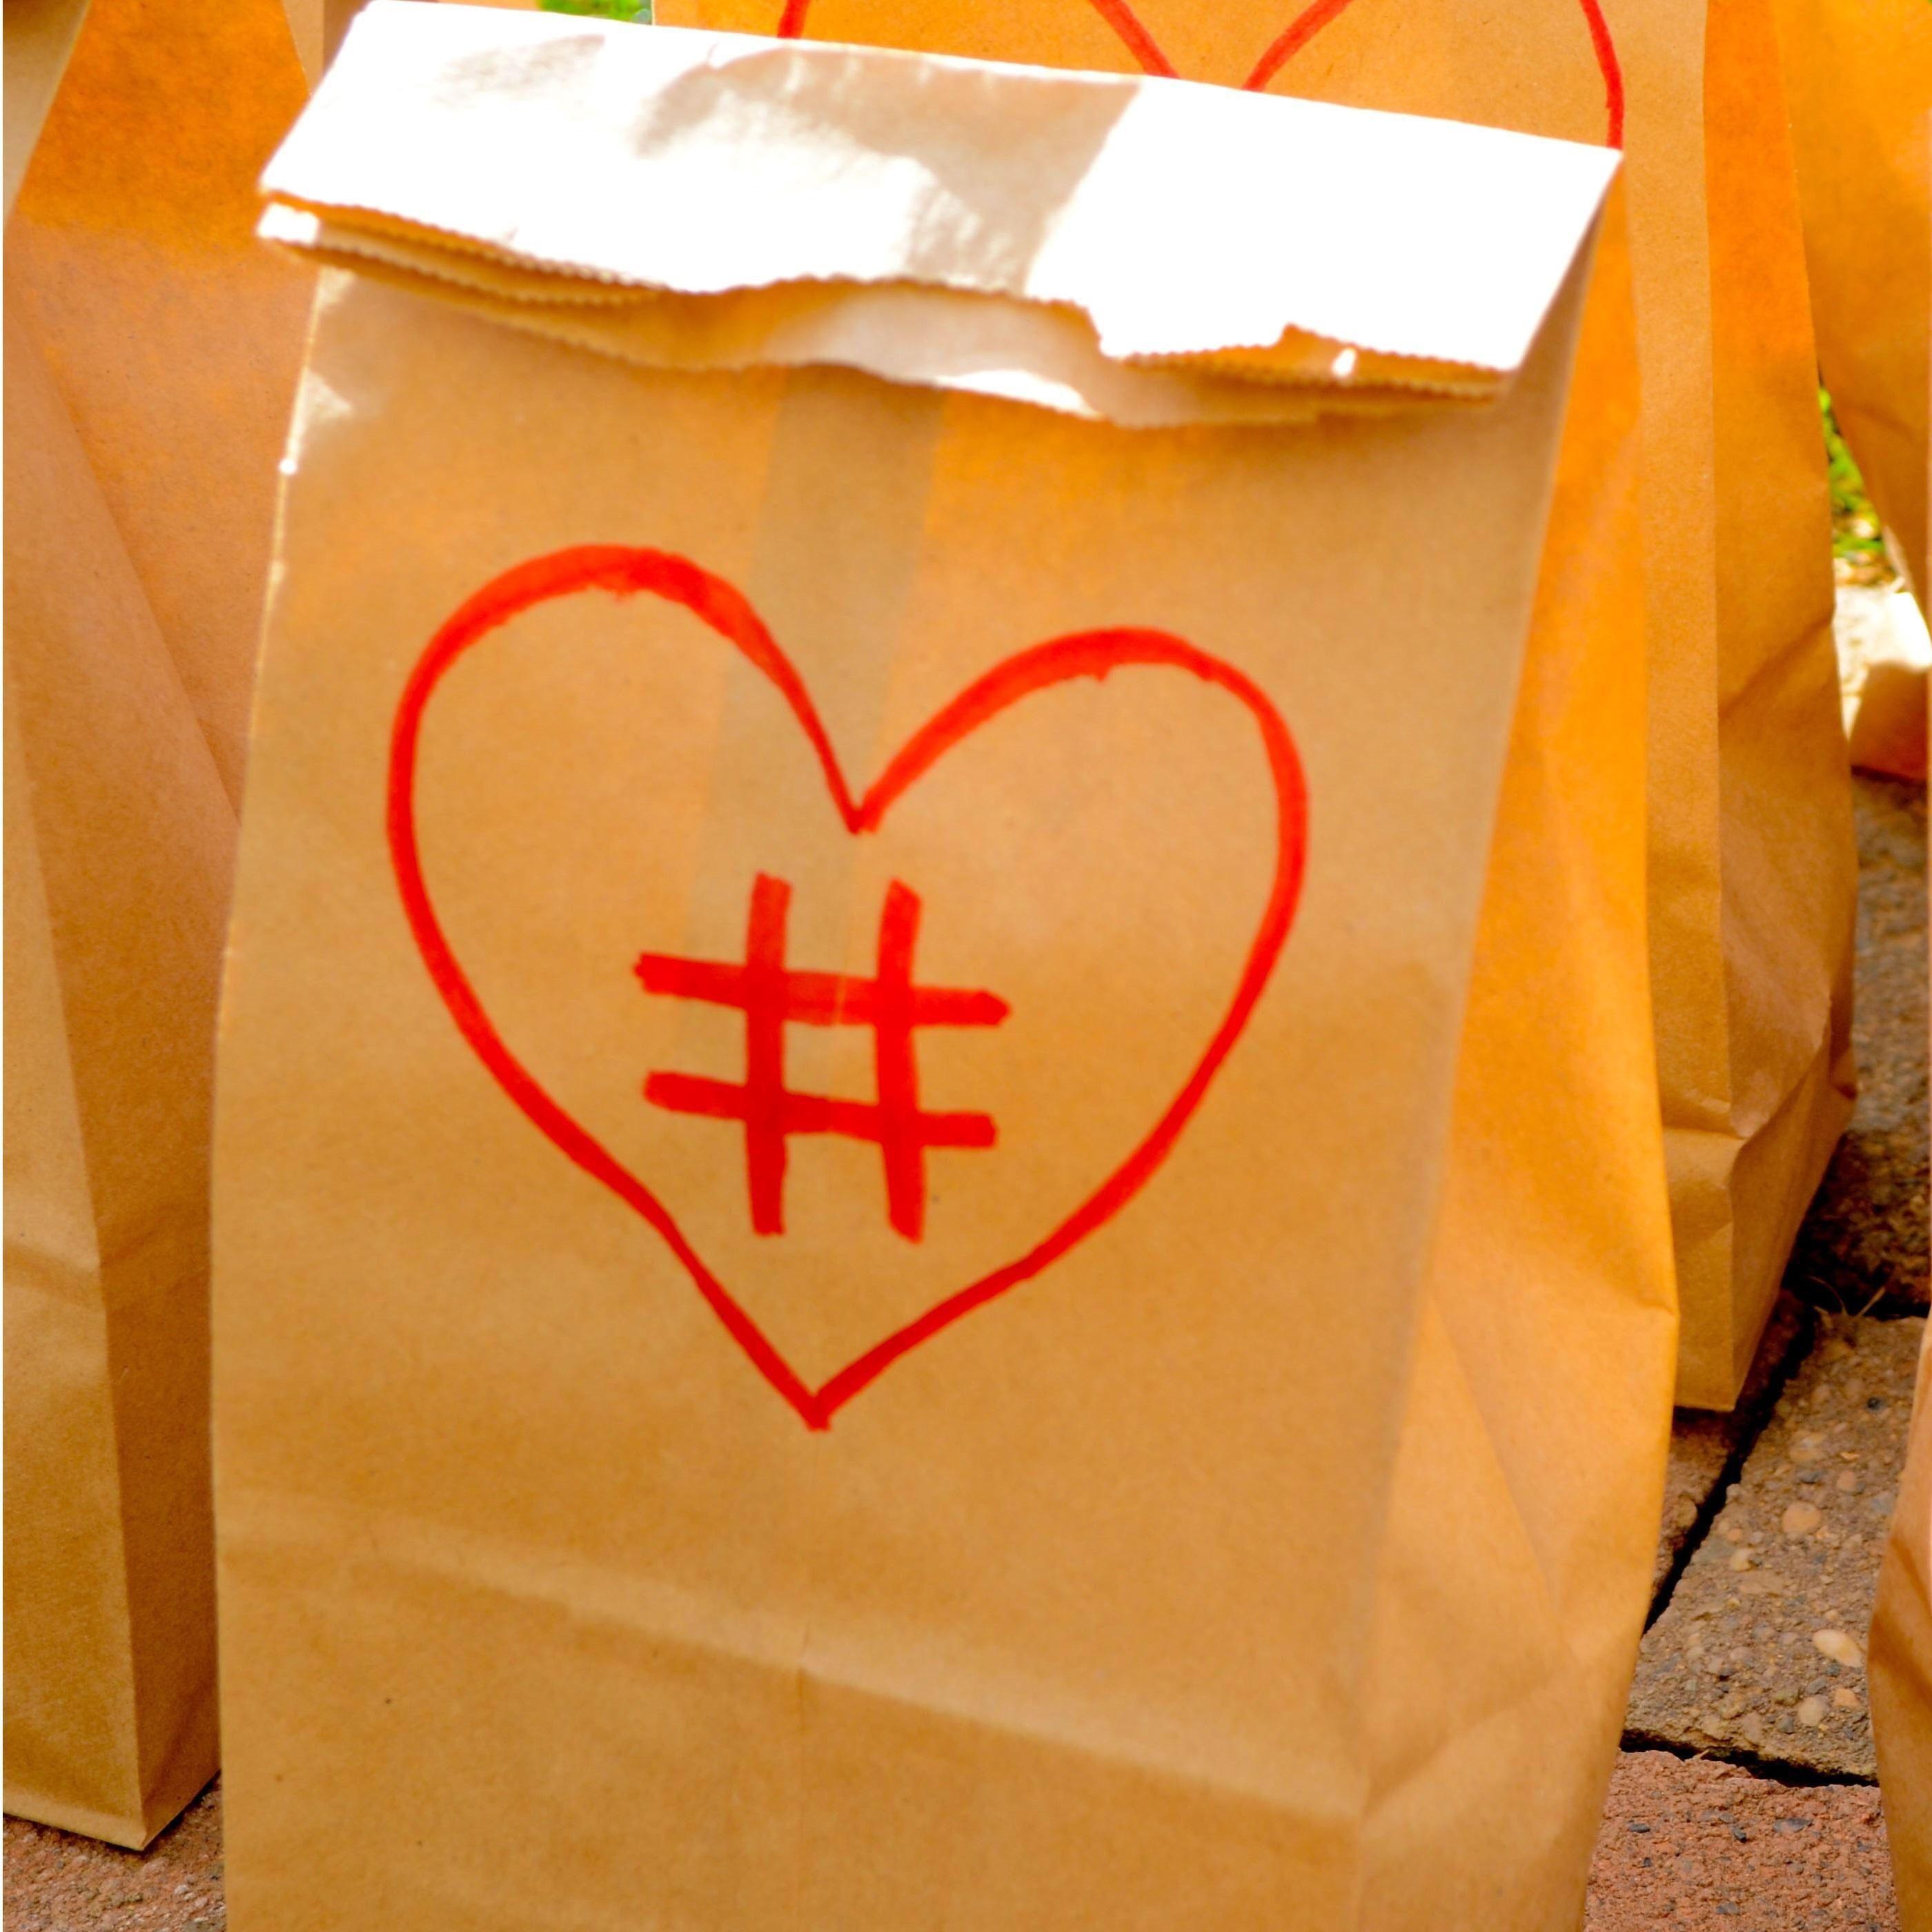 Hashtag Lunchbag La Community Service Event